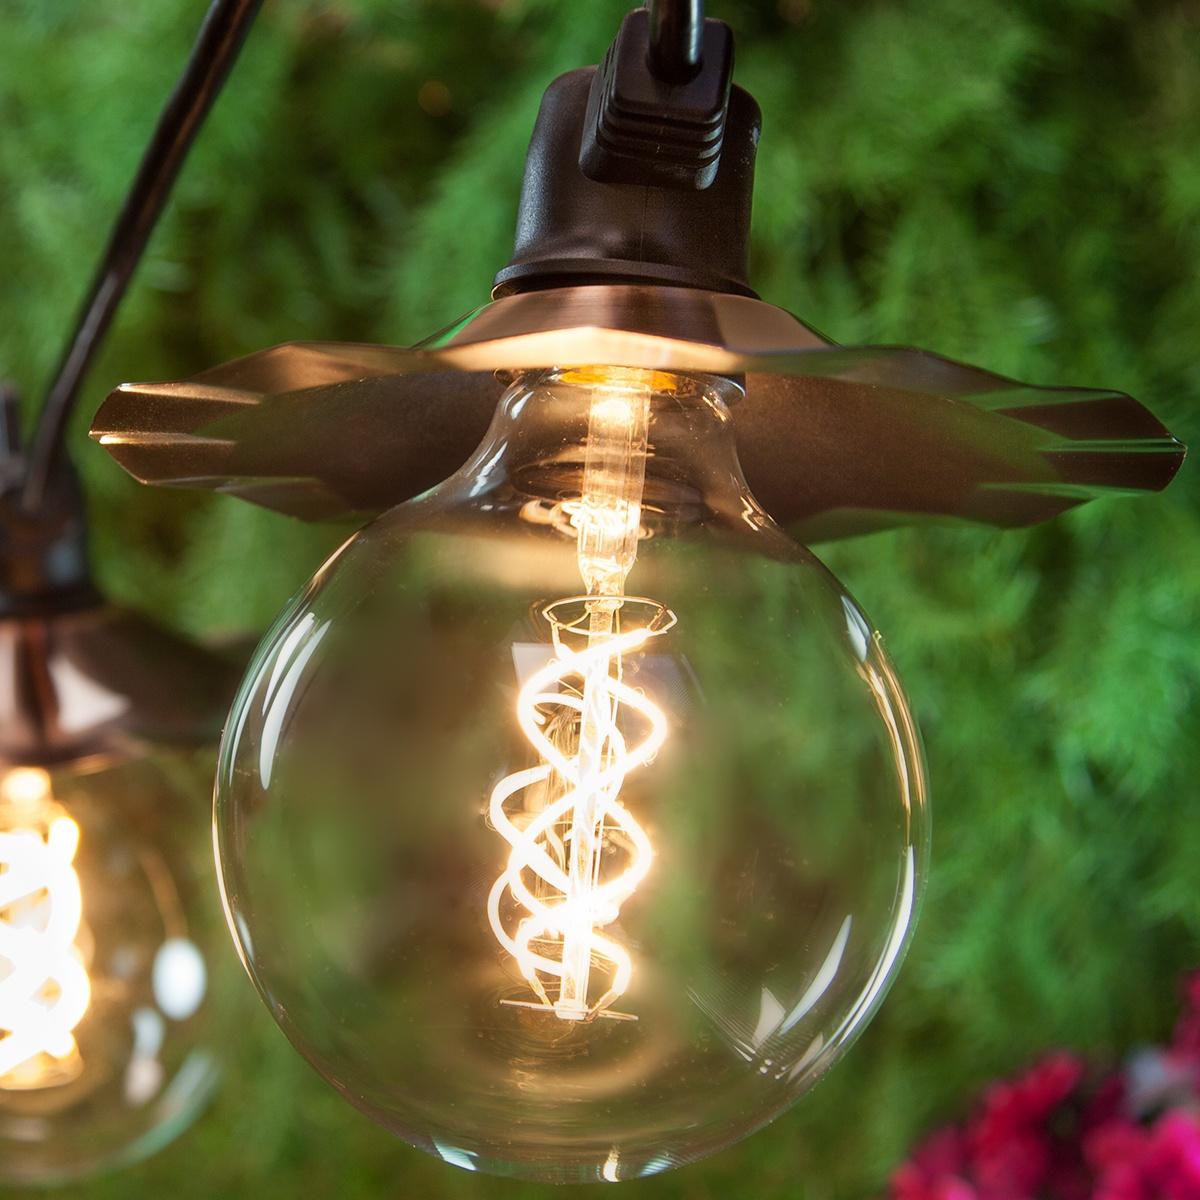 35u0027 Black Patio String Light Set With 7 G125 Warm White FlexFilament TM  Glass LED